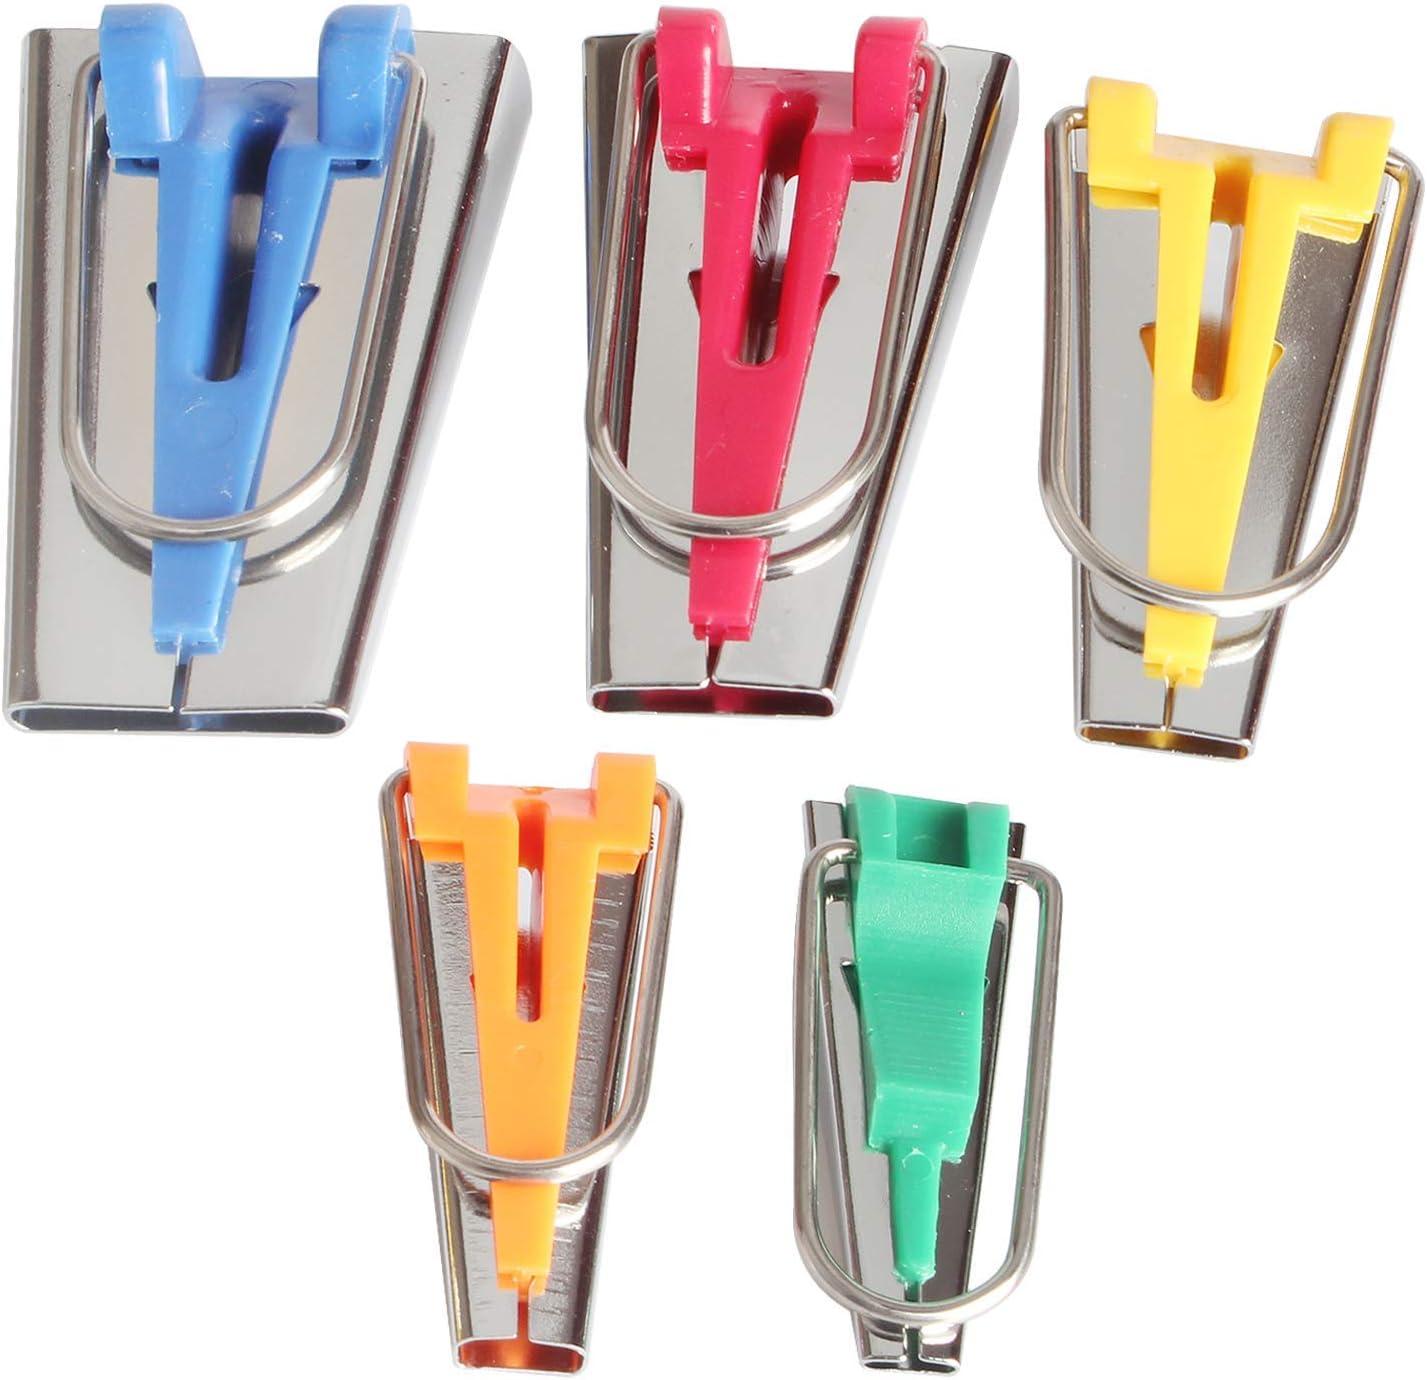 Zeaye Bias Binding Maker Set de 5 tamaños (6 mm / 9 mm / 12 mm / 18 mm / 25 mm) para coser y acolchar cinta al bies, para hacer cinta al bies de tela, accesorios para de coser para bricolaje patchwork